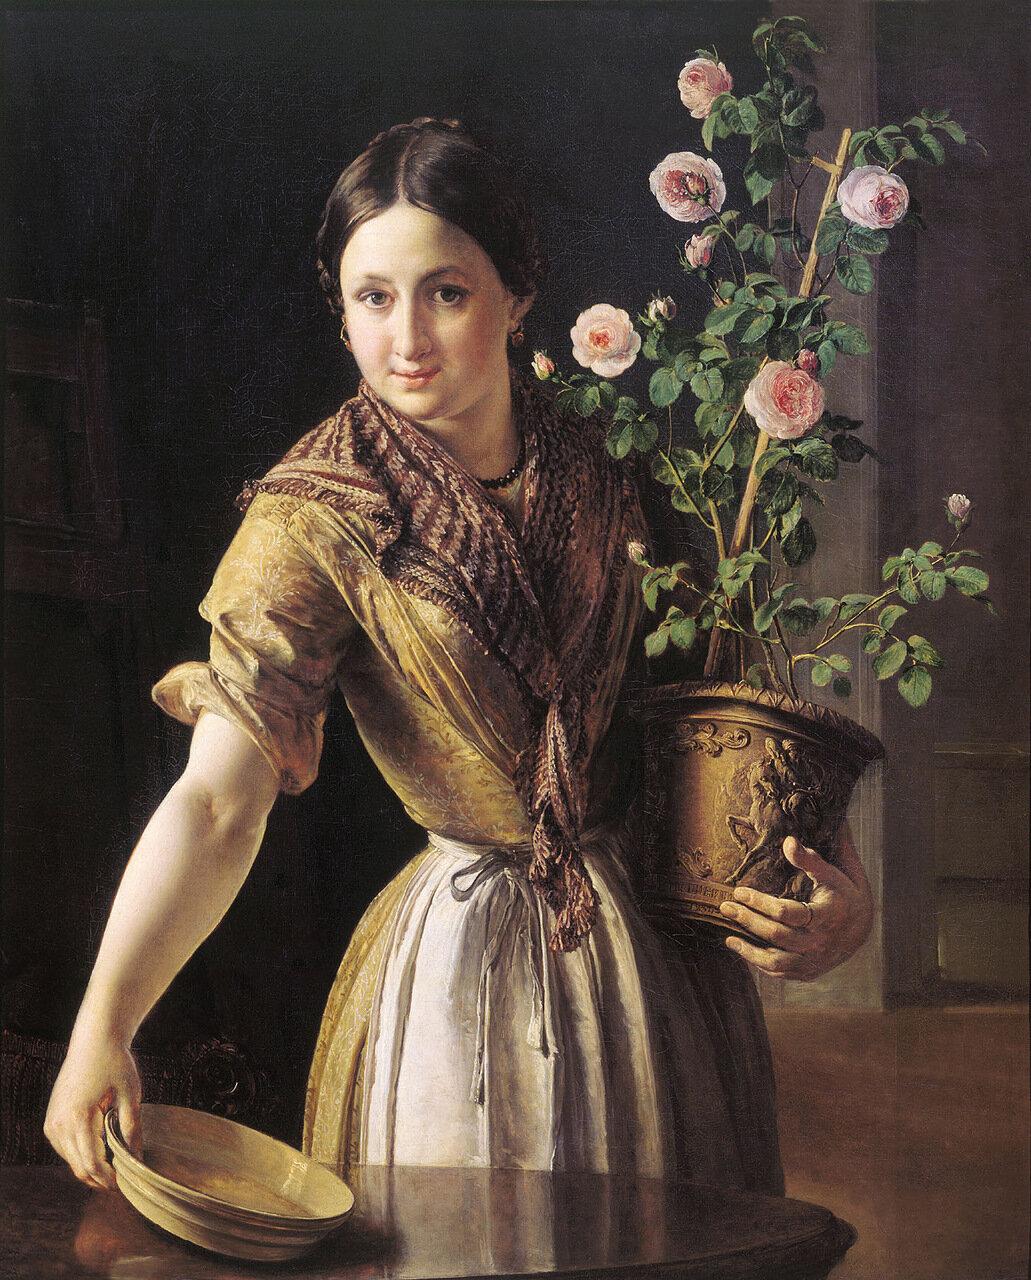 Девушка с горшком роз 1850. Холст, масло. 100х81 см.jpg